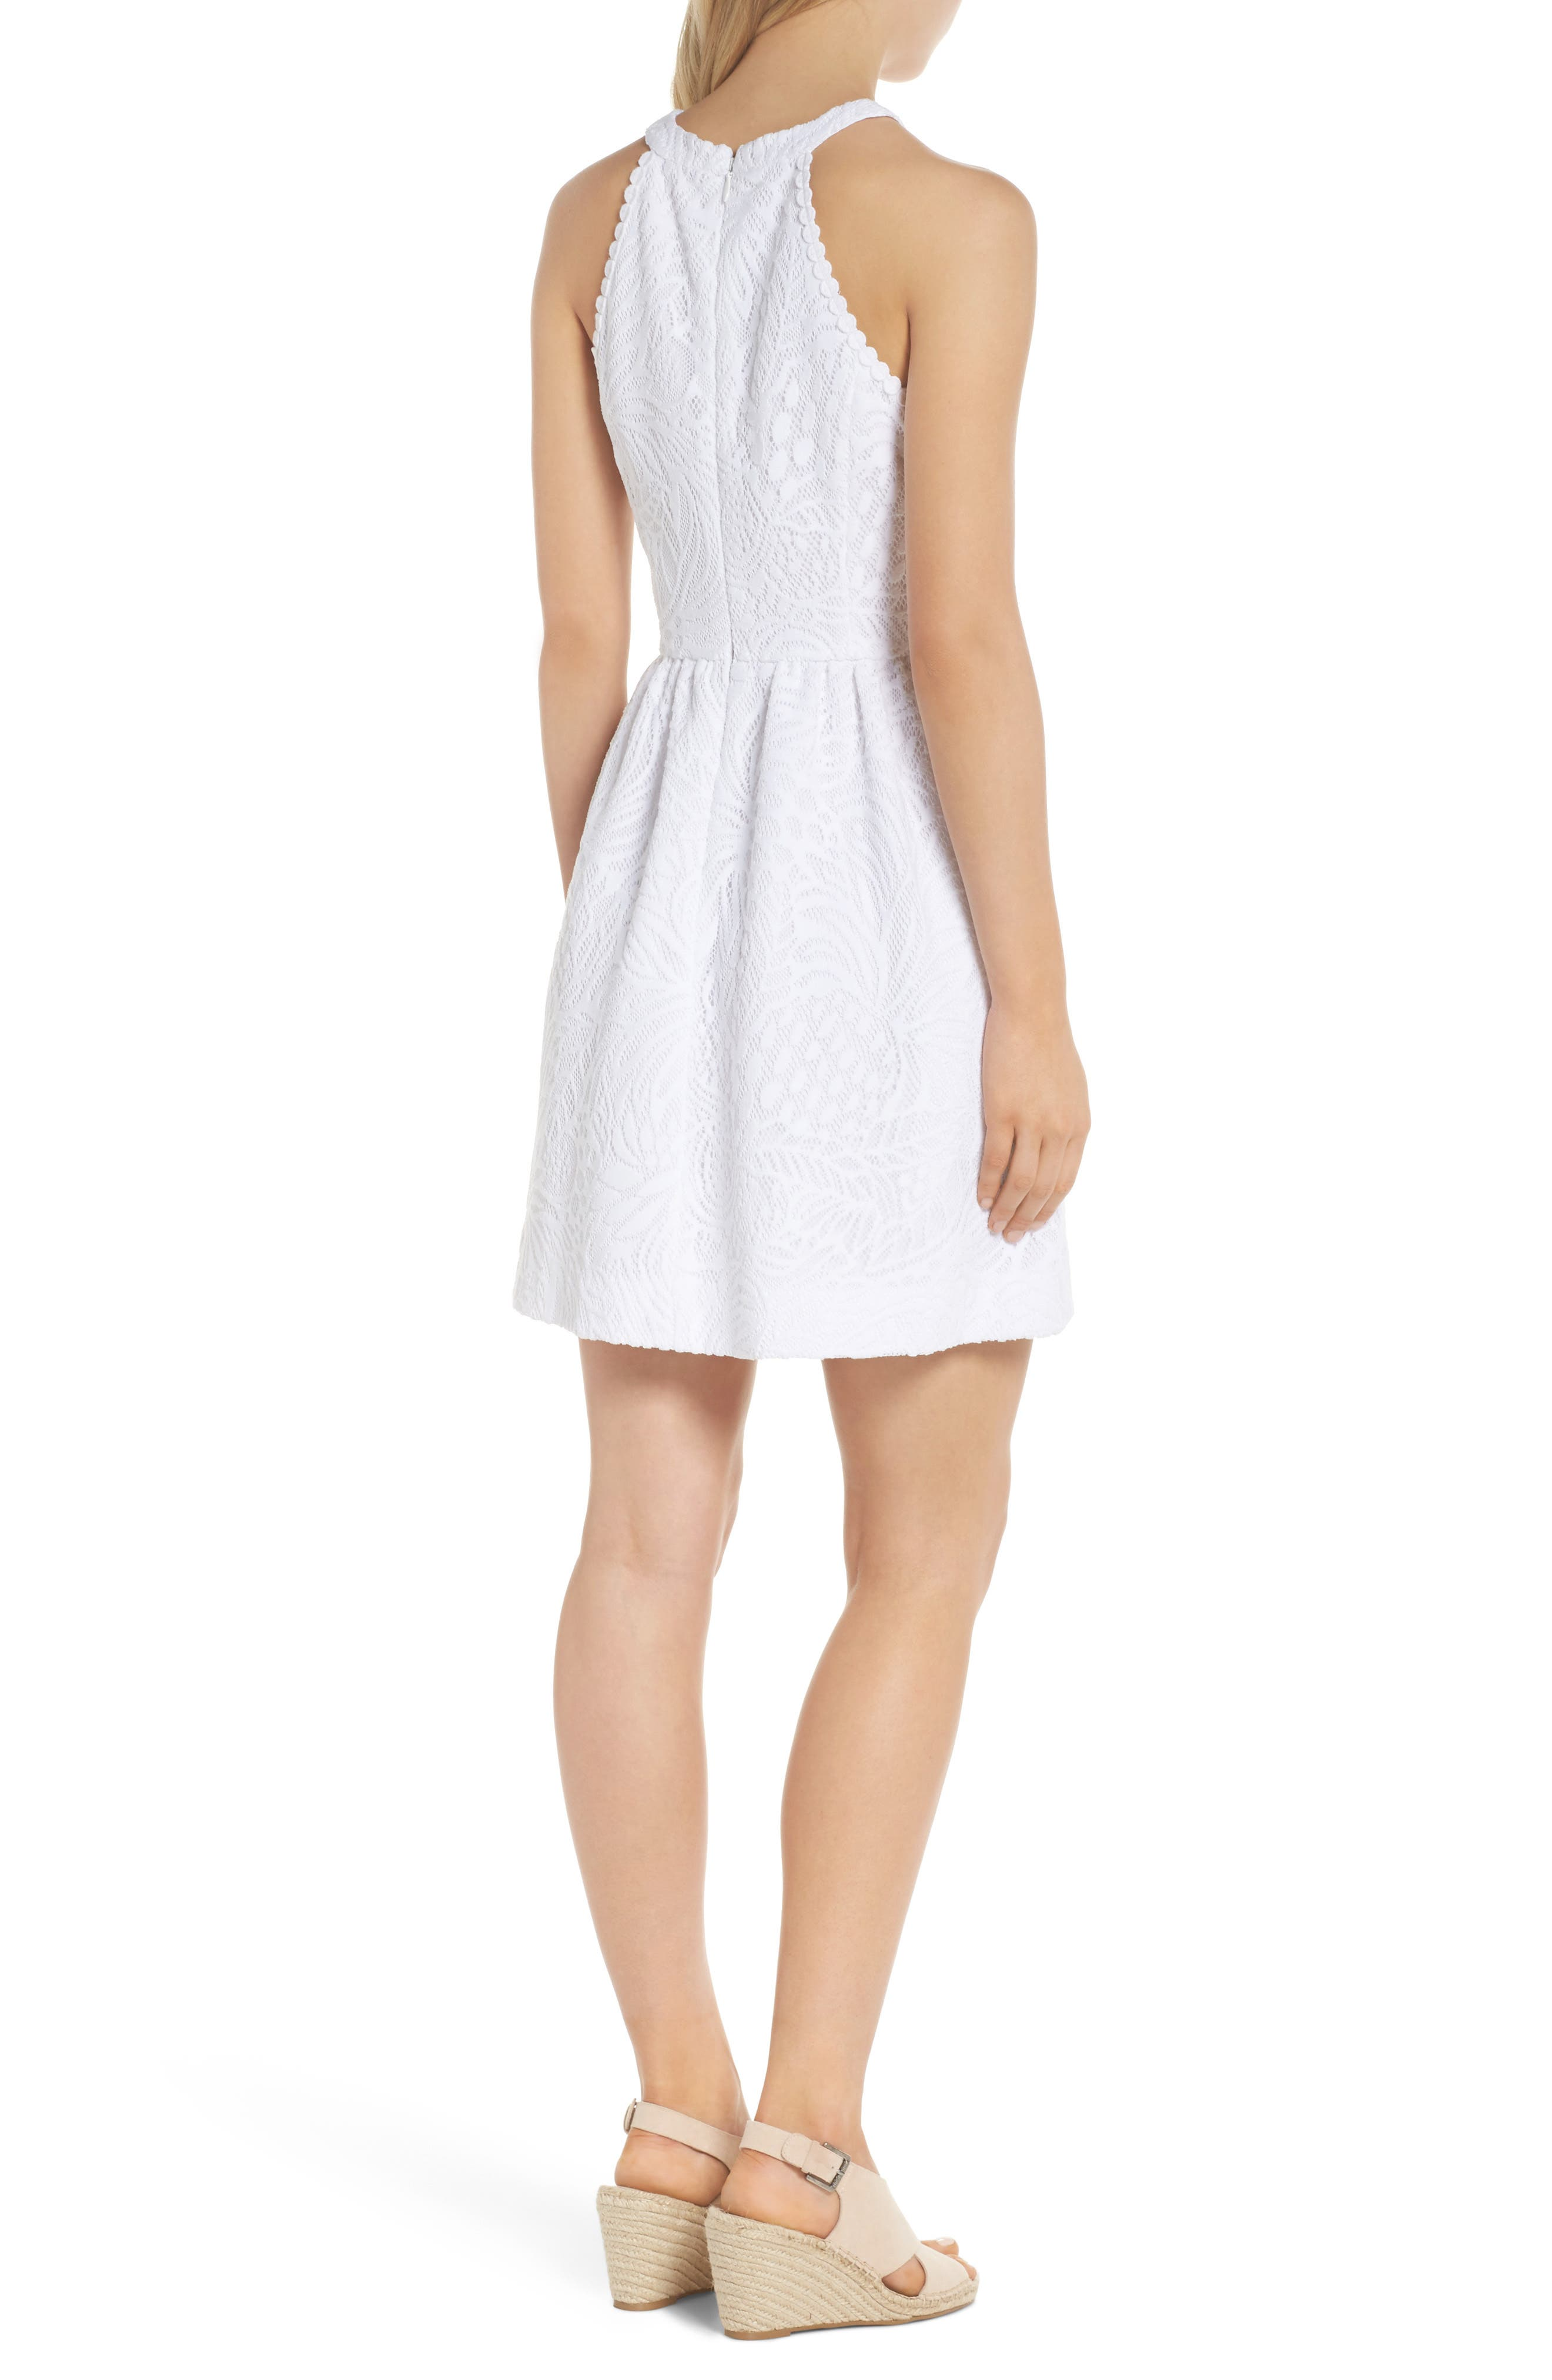 Kinley Halter Dress,                             Alternate thumbnail 2, color,                             RESORT WHITE TROPICAL LACE